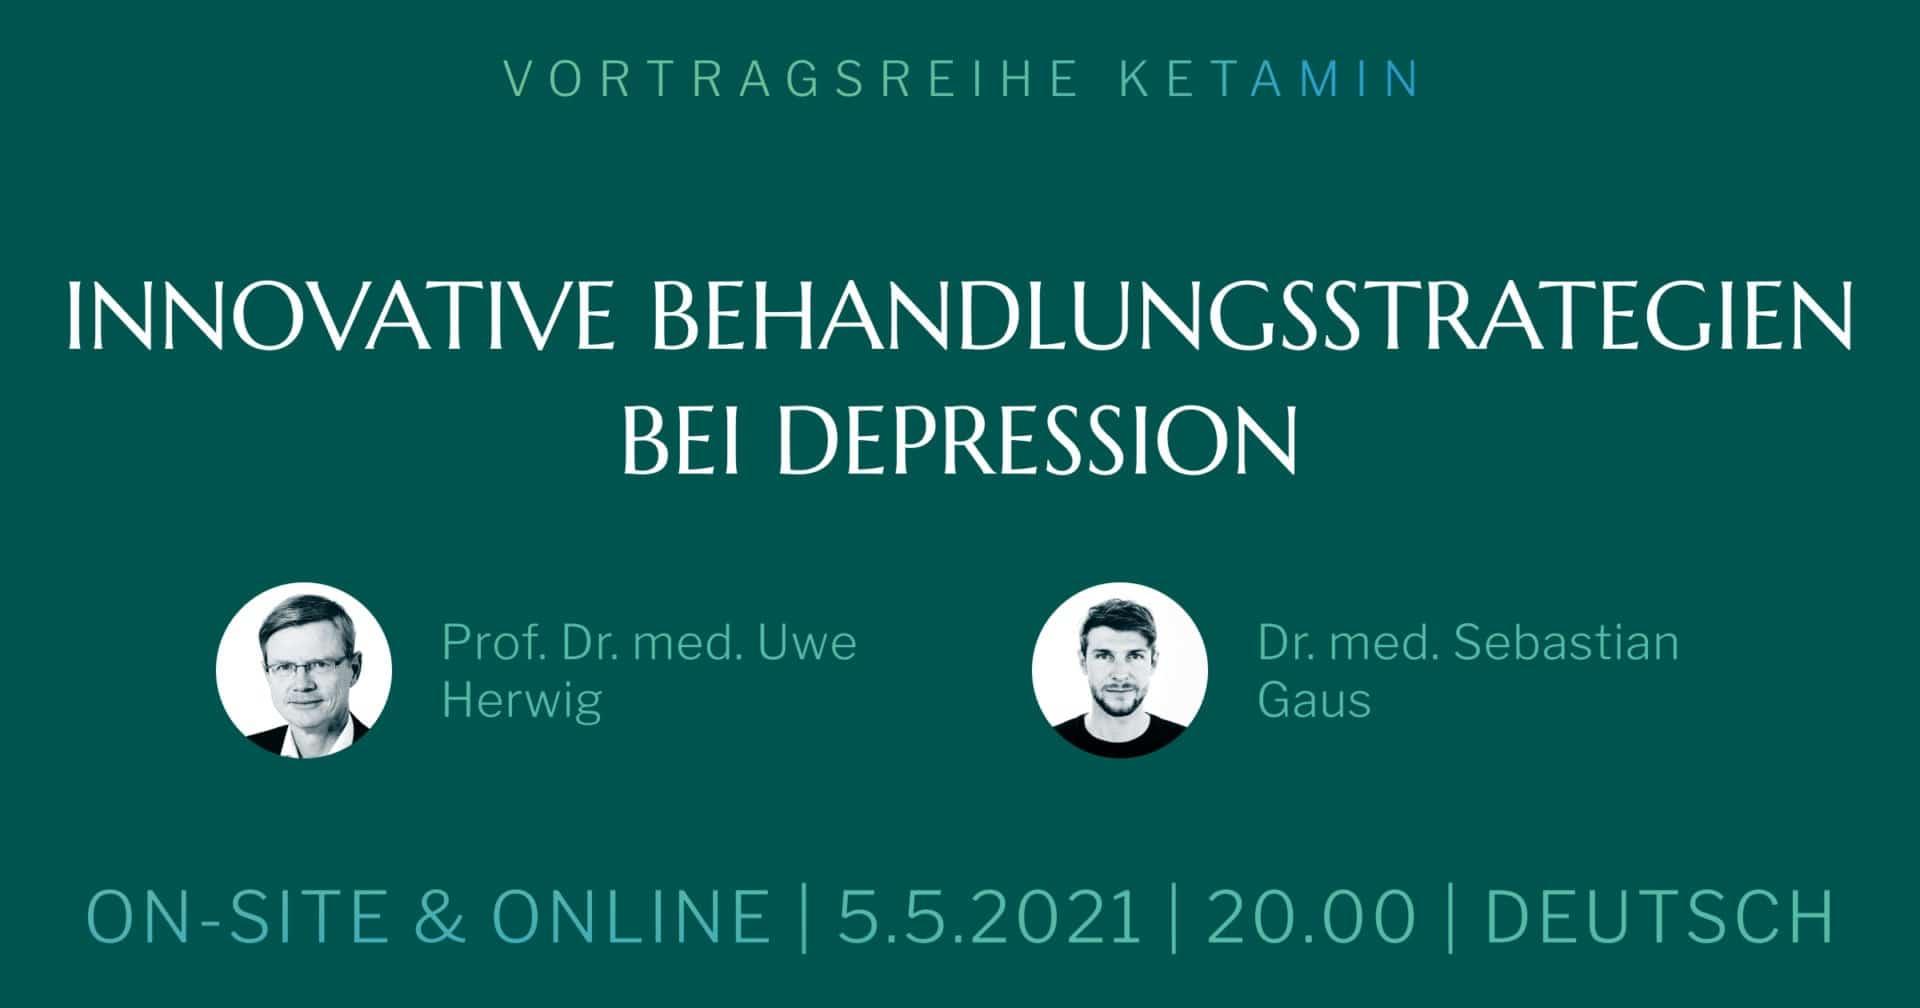 Innovative Behandlungsstrategien bei Depression